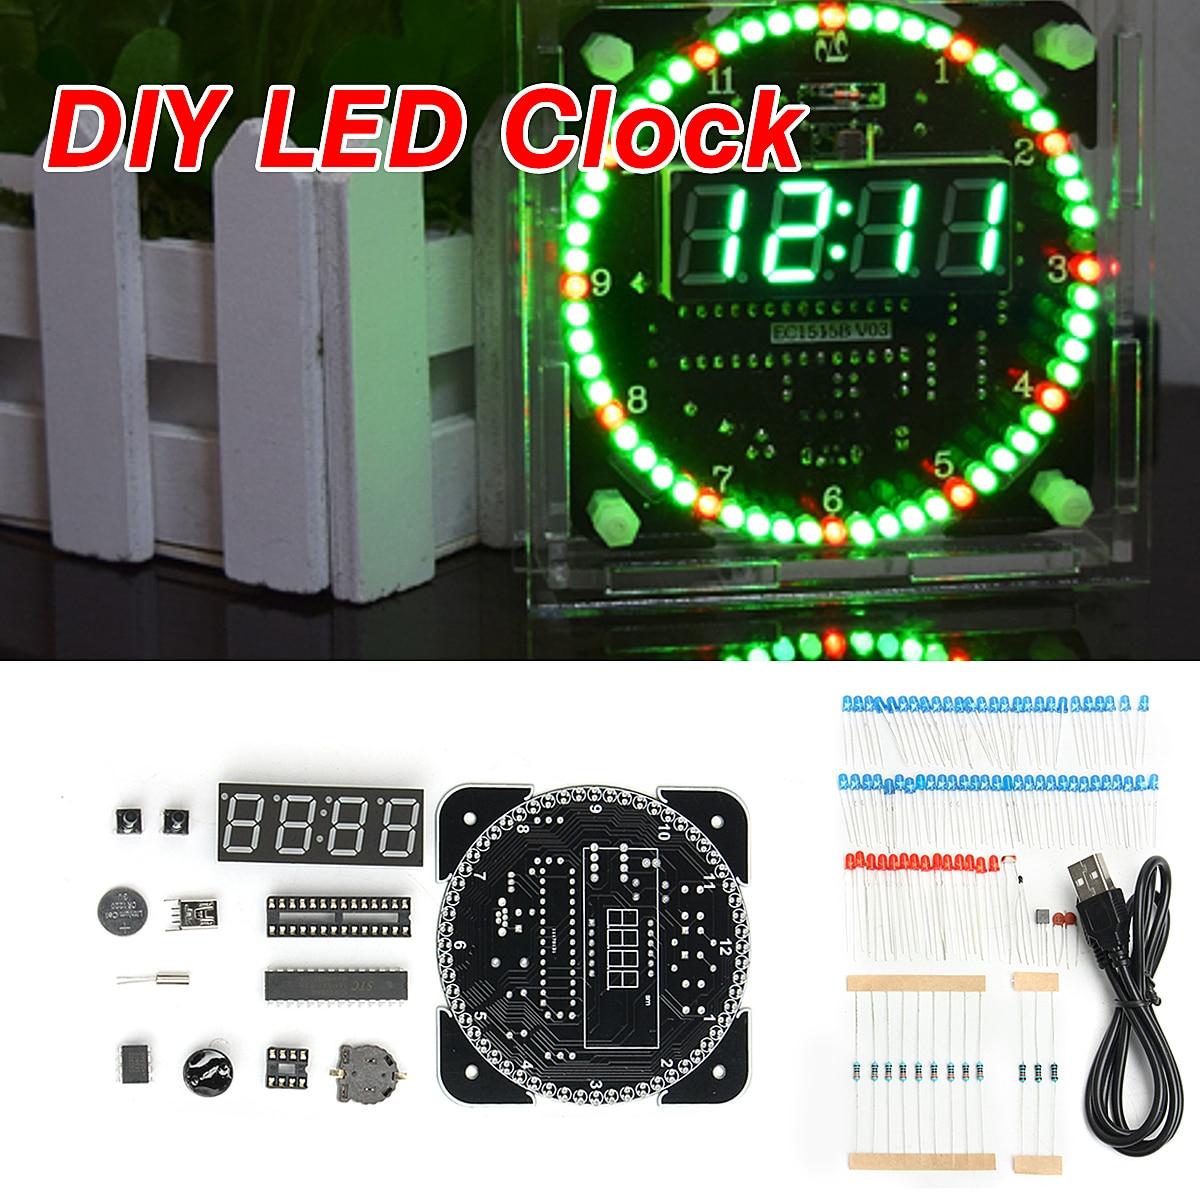 US $9 01 32% OFF|DIY LED Electronic Digital Alarm Clock DS1302 Rotating Kit  51 SCM Learning Board 5V xp Date Display Principle Design-in Alarm Clocks